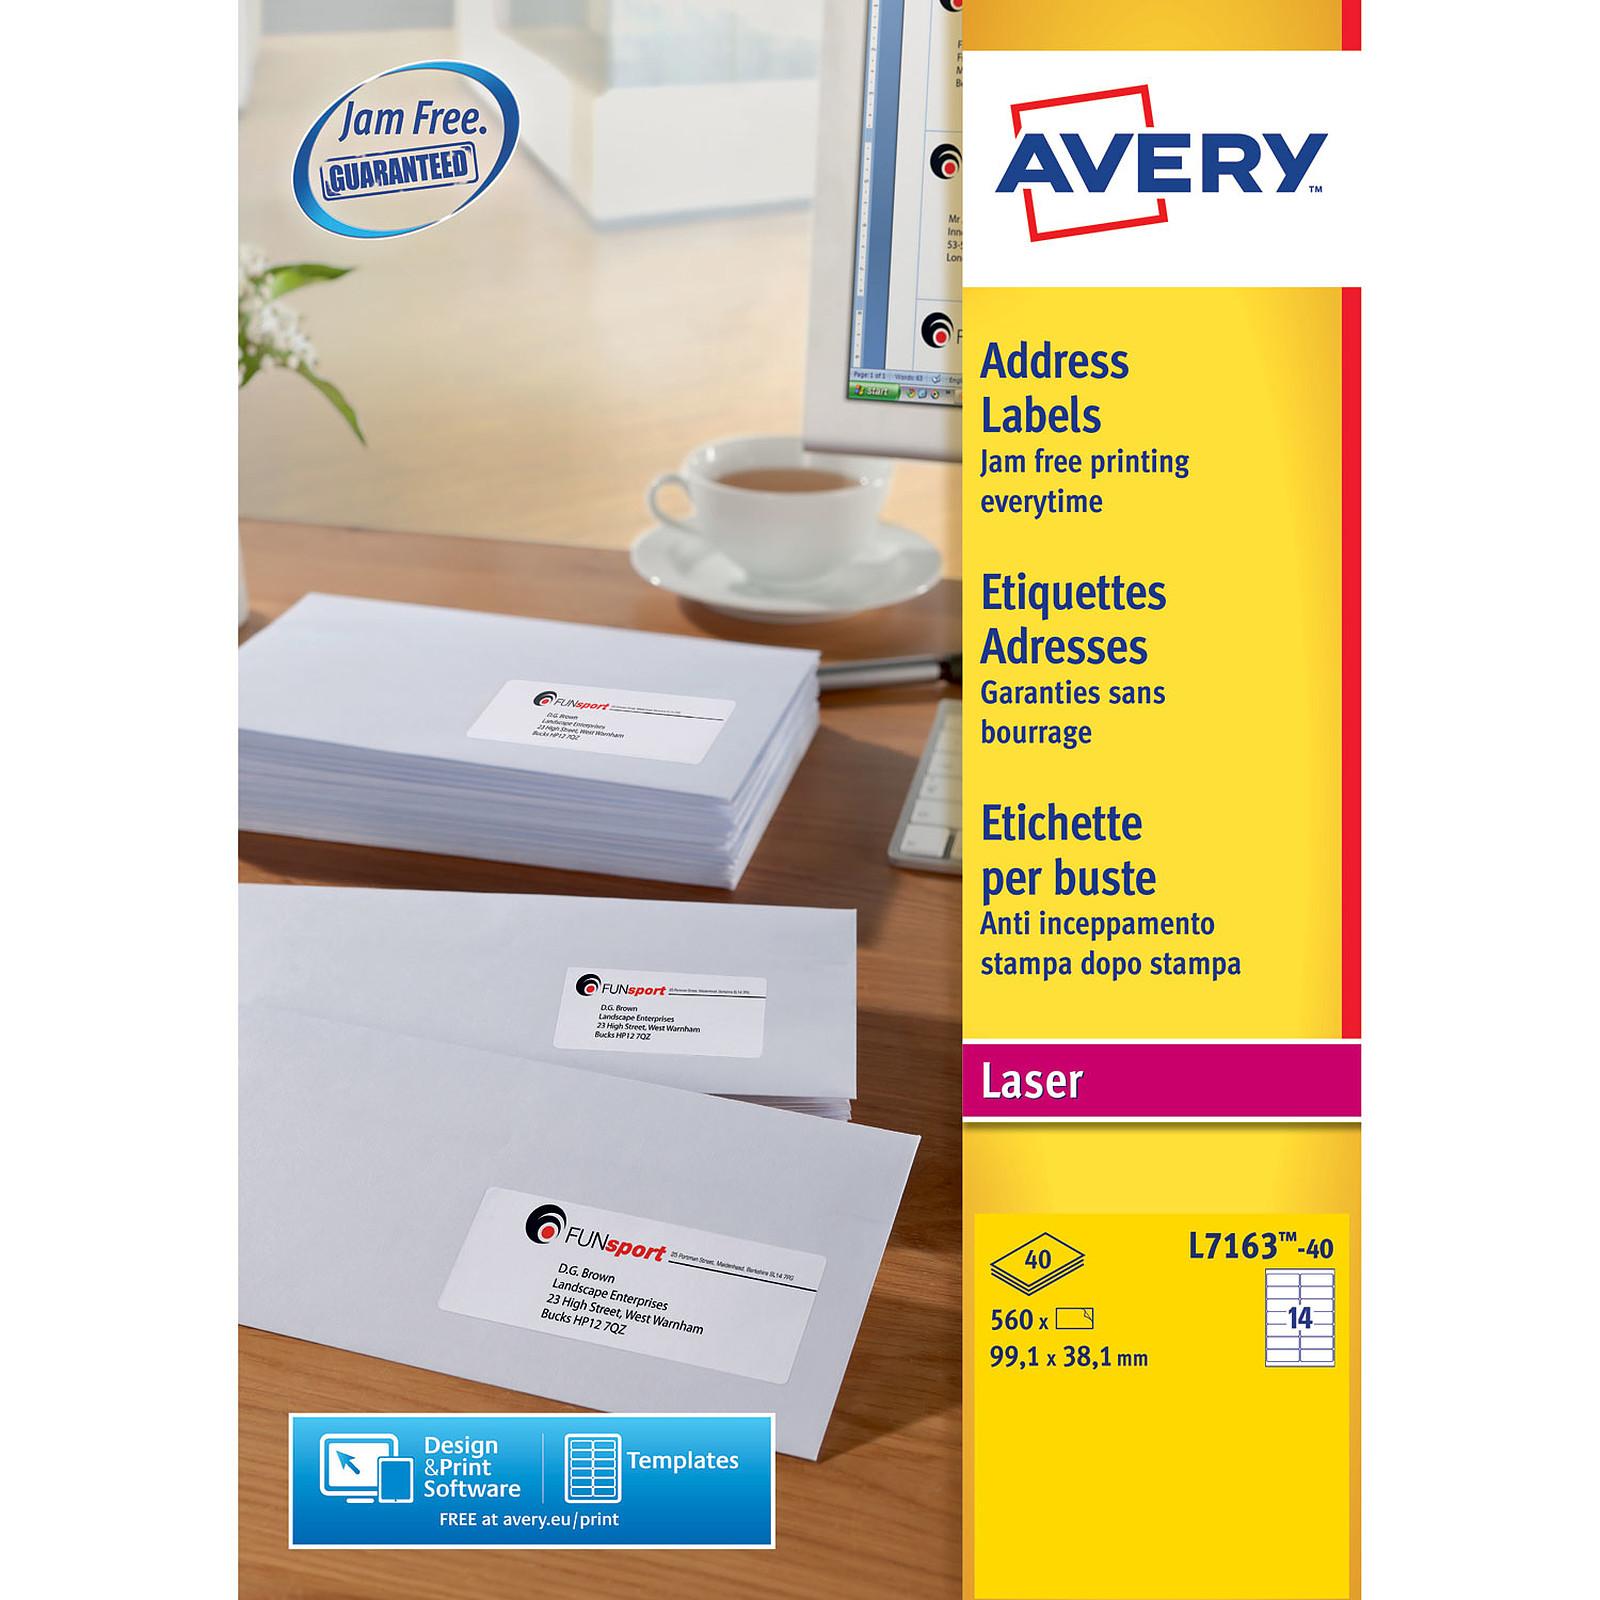 Avery Etiquettes adresse 99.1 x 38.1 mm x 560